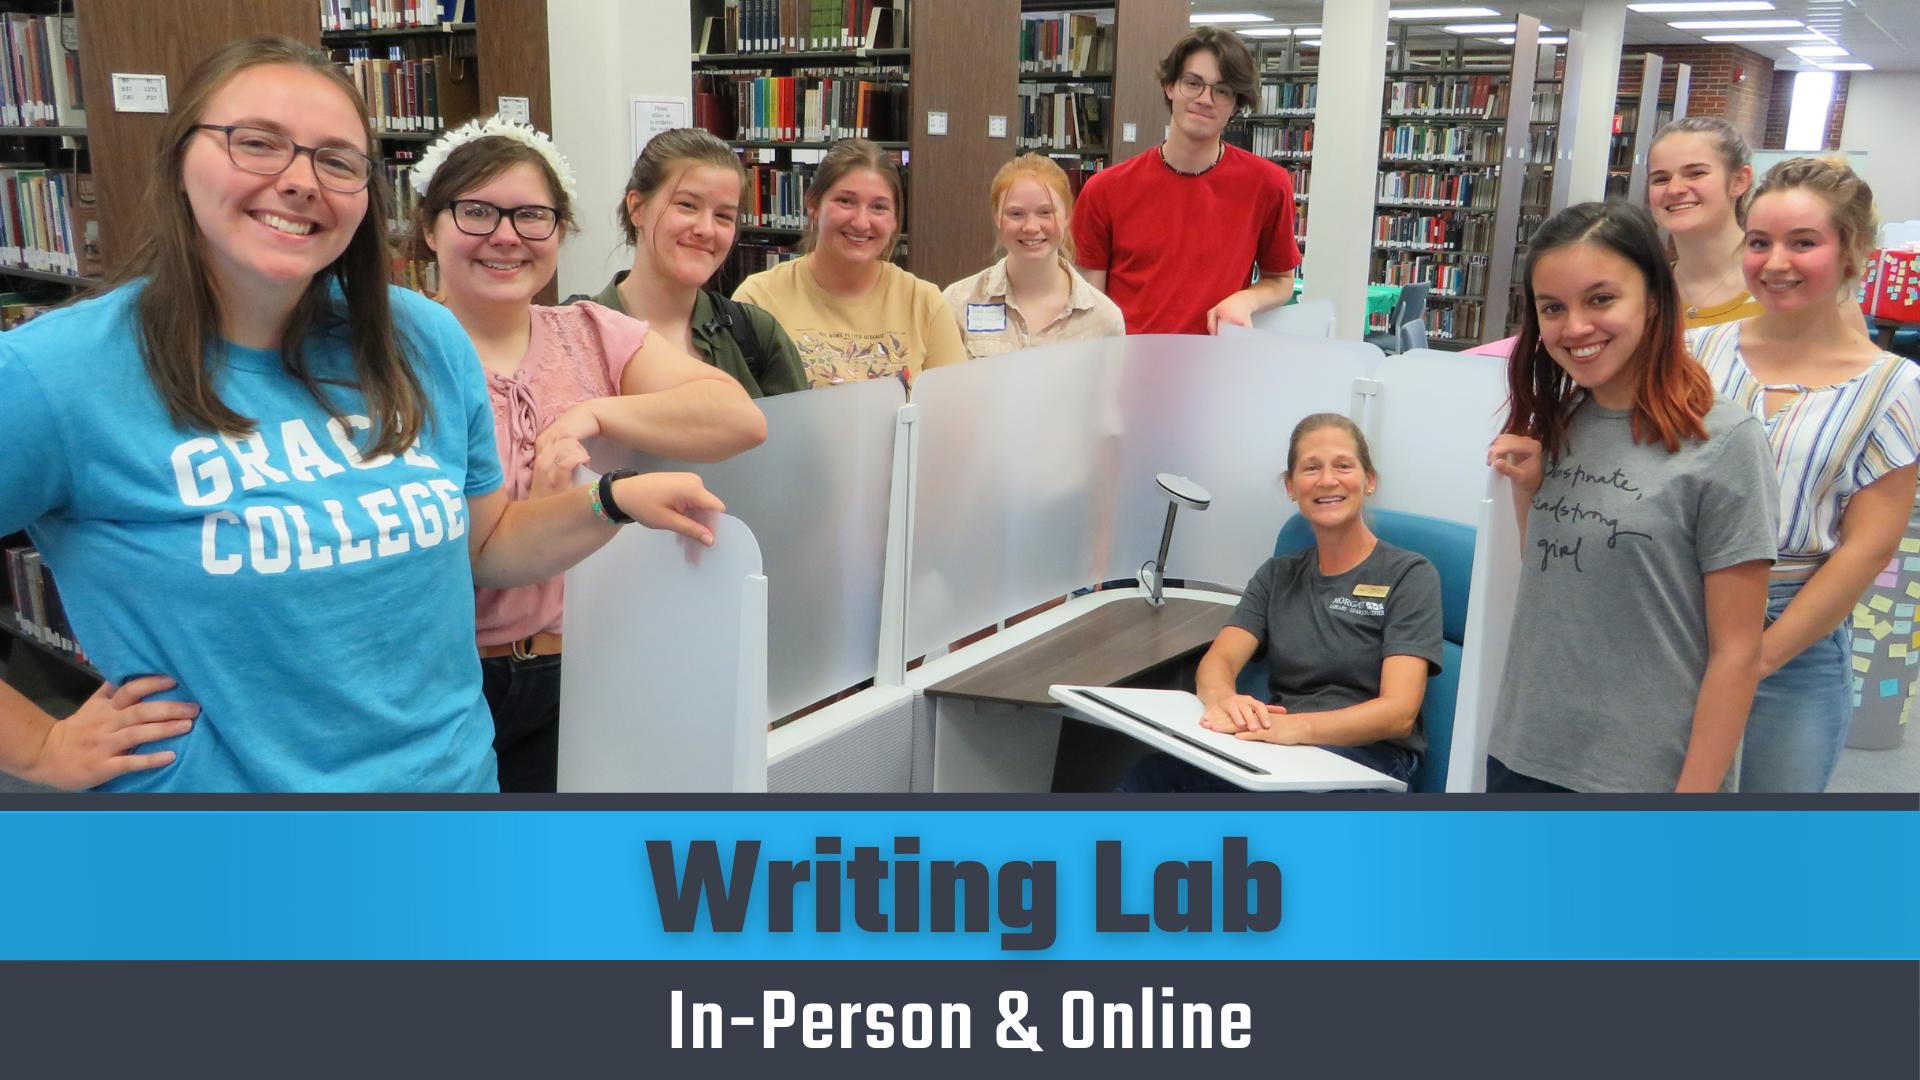 Writing Lab